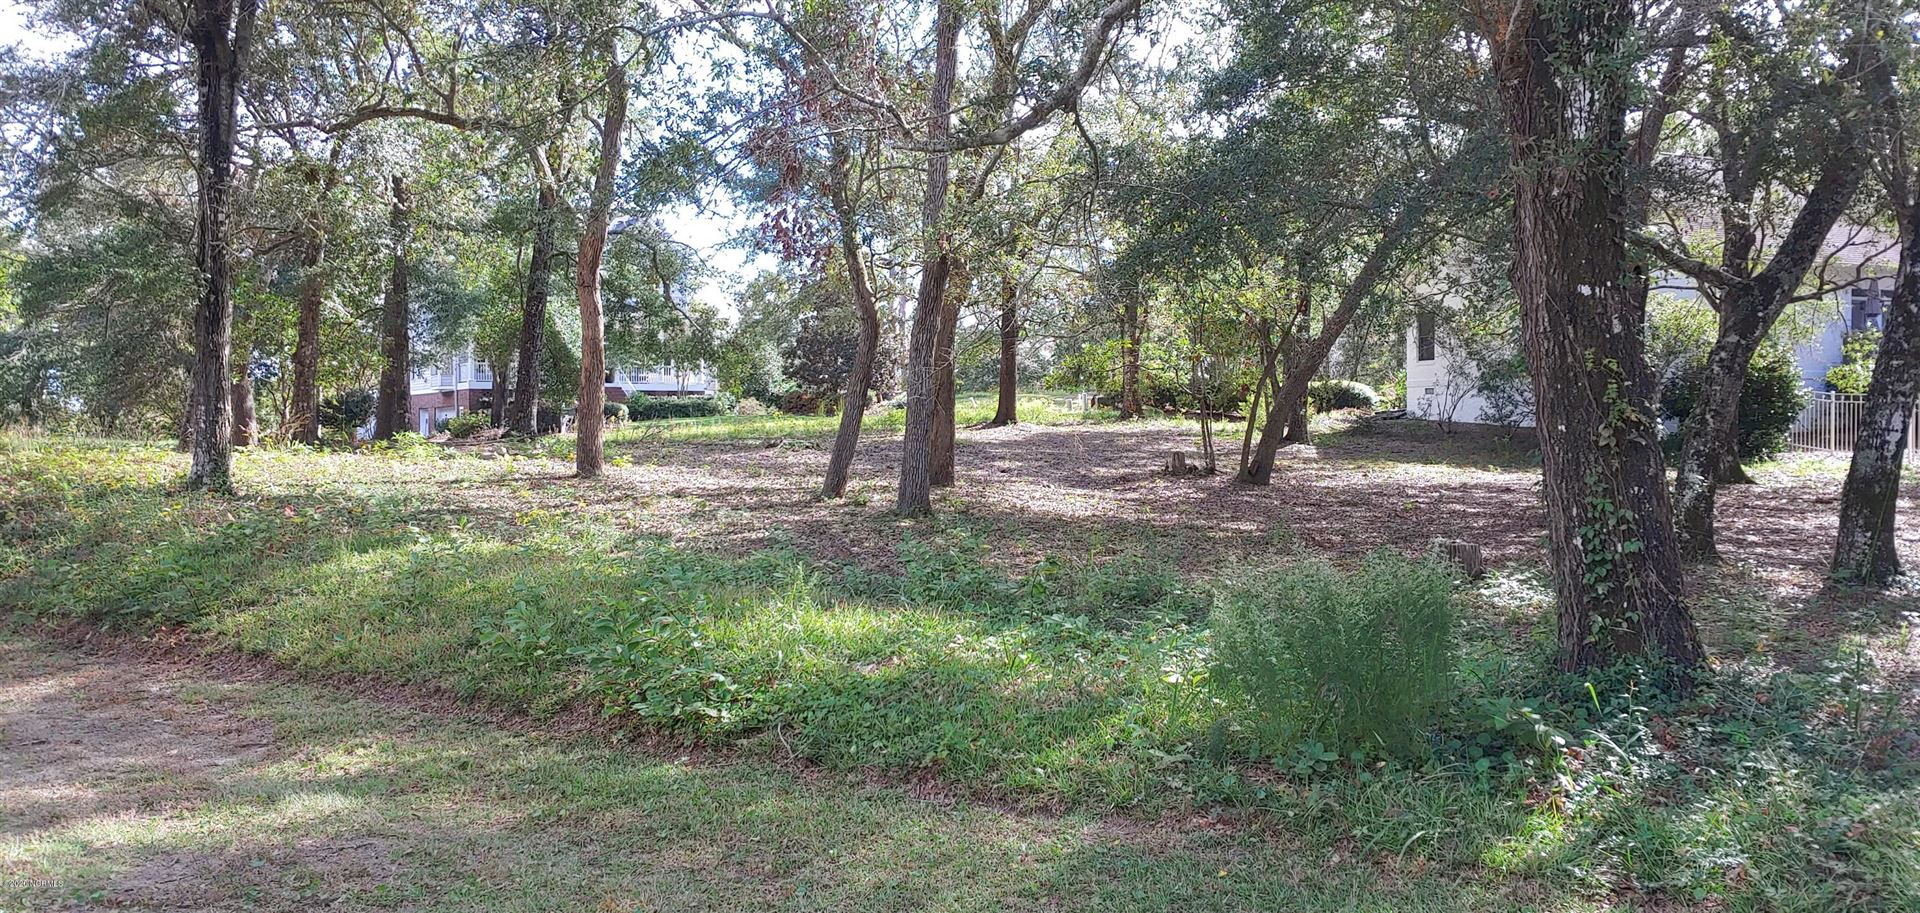 Photo of 0 Pebble Shore Lane, Southport, NC 28461 (MLS # 100242677)